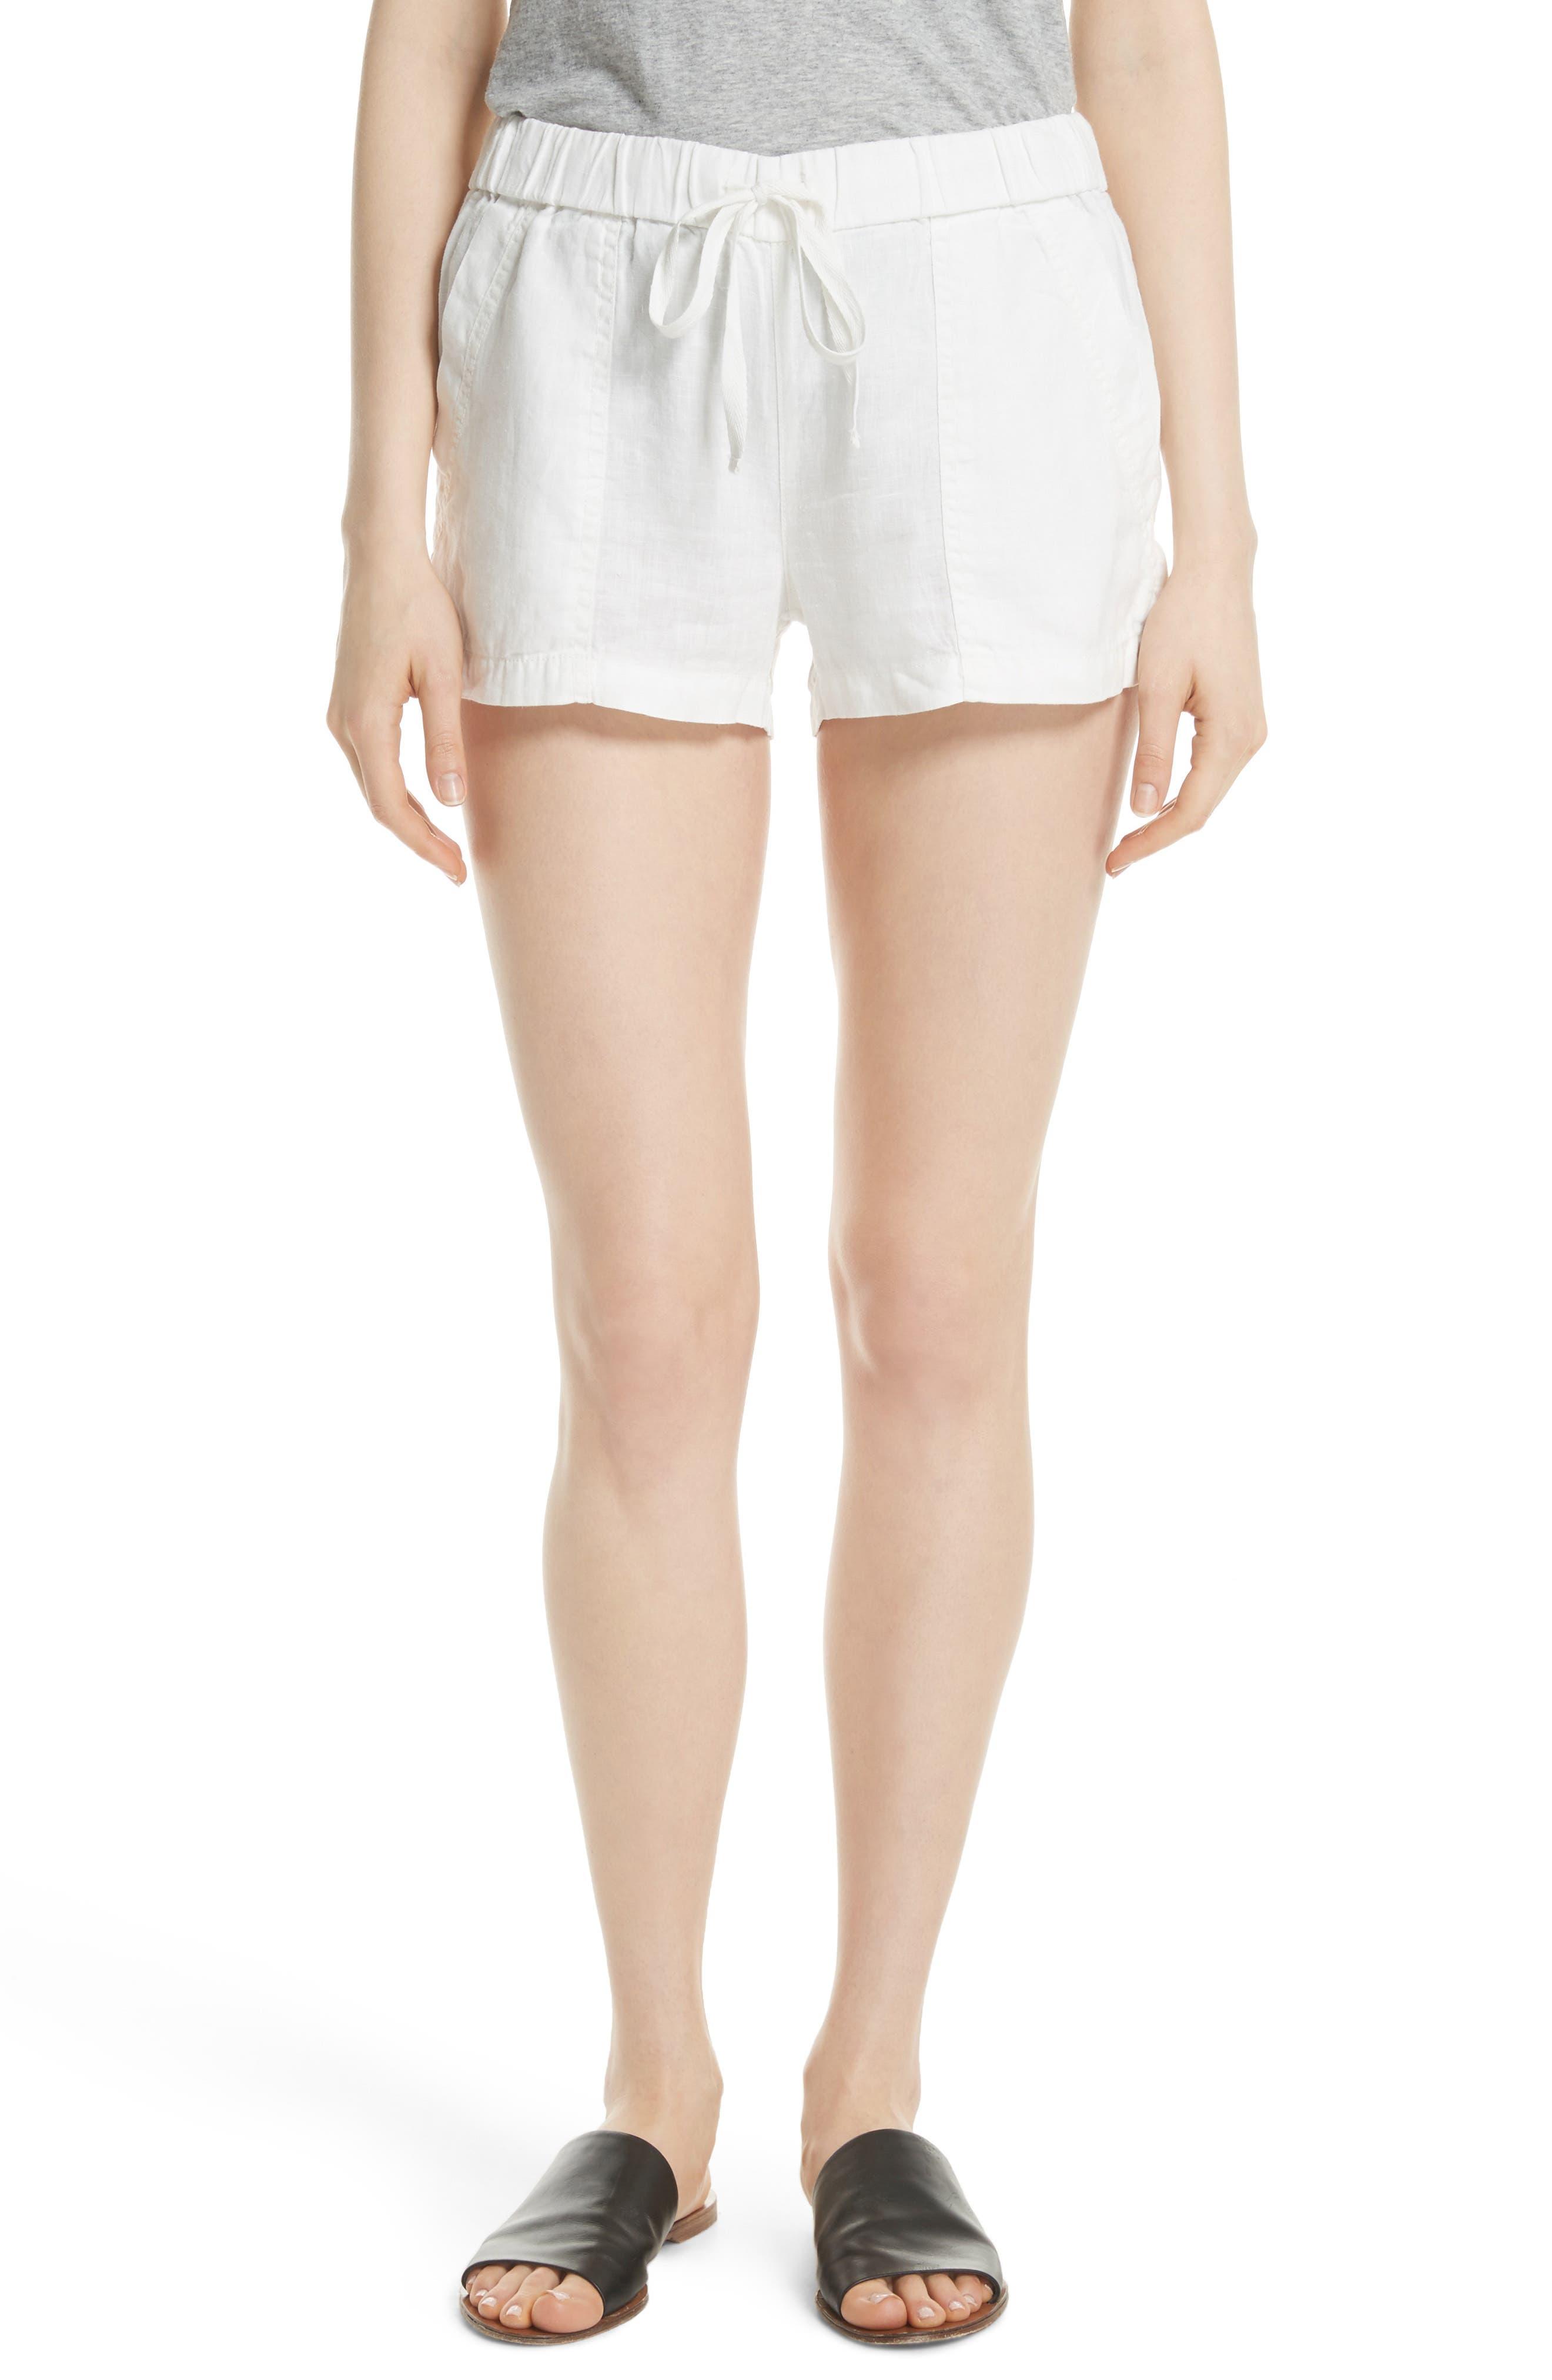 Fosette Linen Drawstring Shorts,                             Main thumbnail 1, color,                             Porcelain